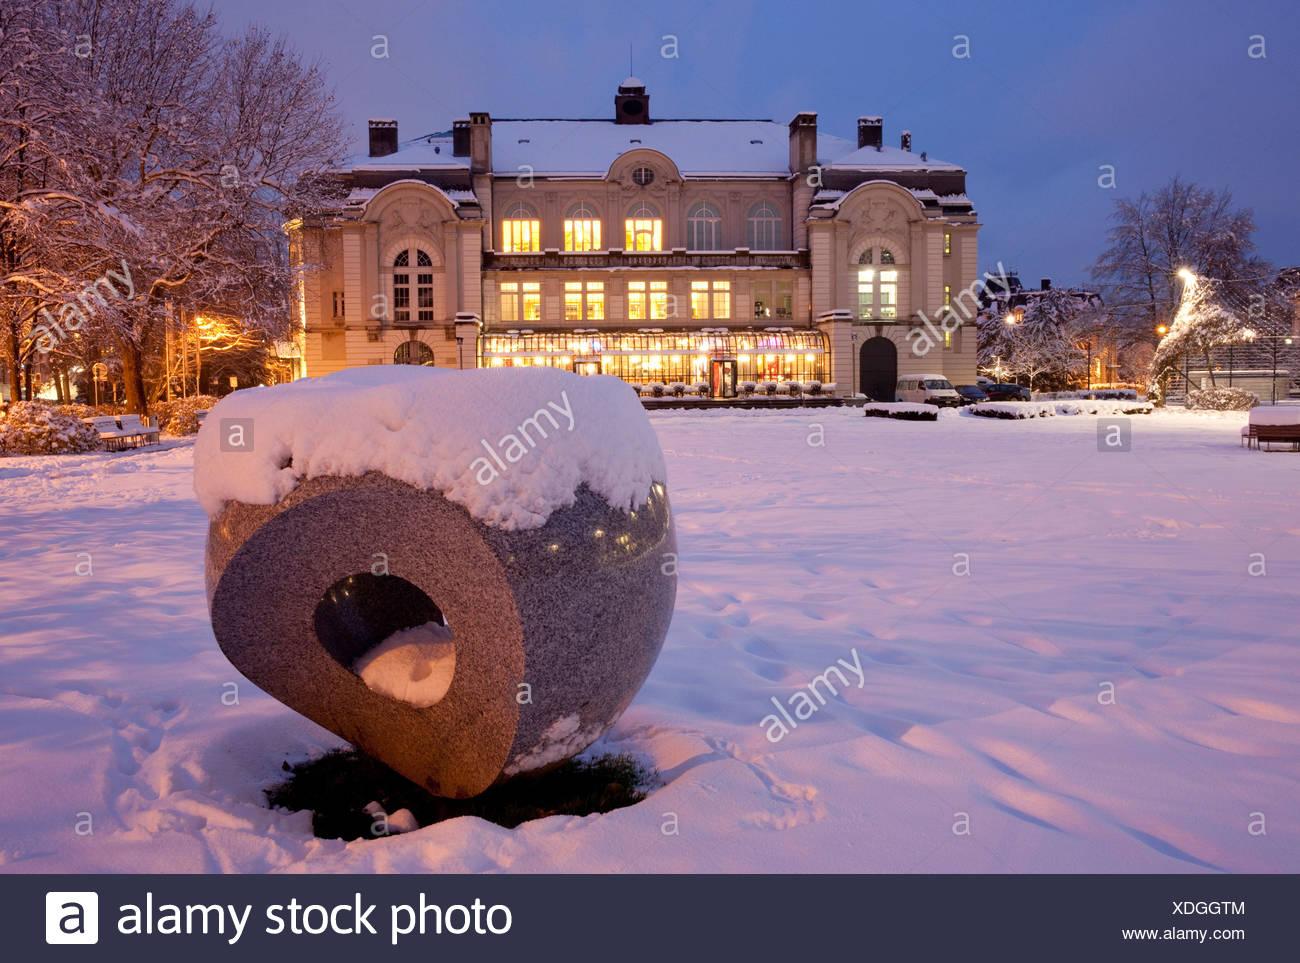 Switzerland, Europe, night, dark, Christmas, Advent, canton, SG, St. Gallen, St. Gall, sound hall, evening, lights, winter - Stock Image